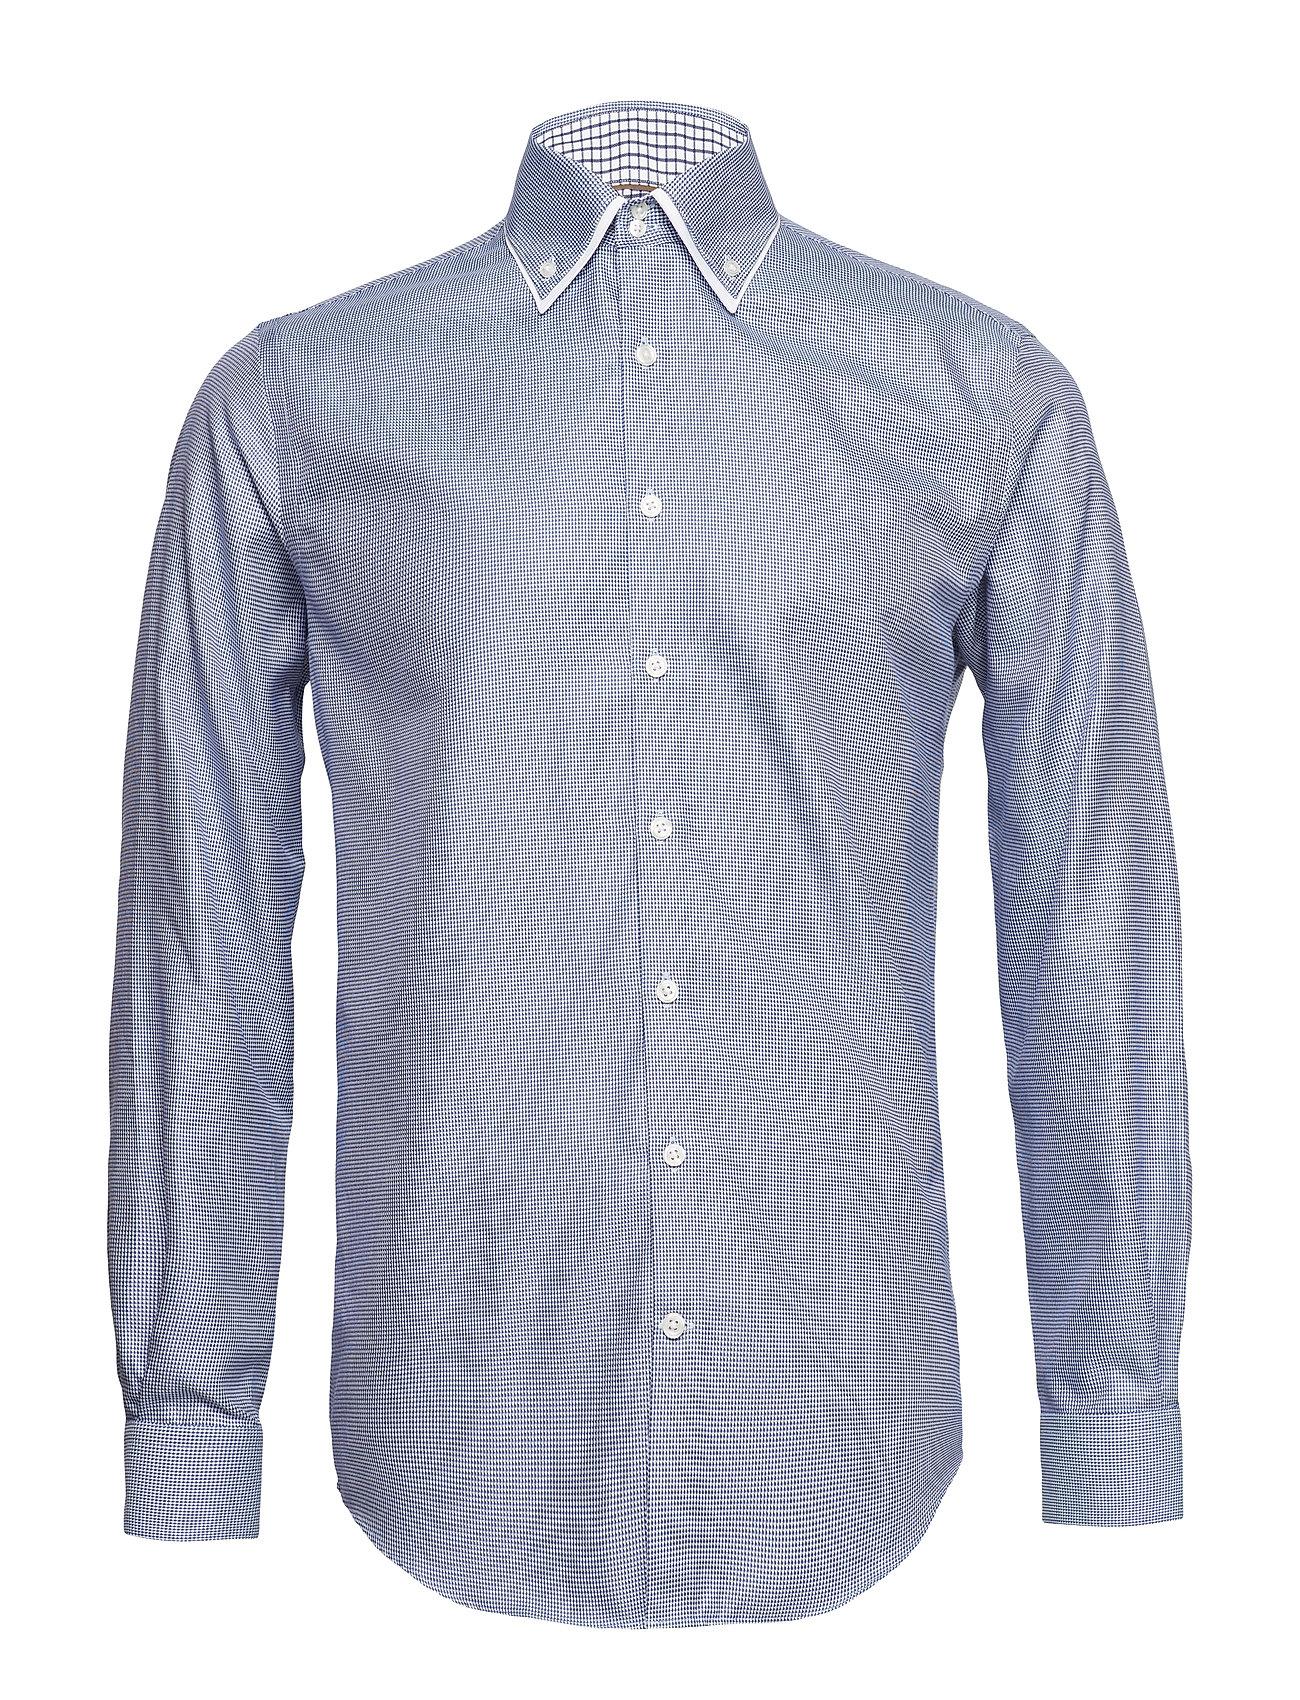 Lindbergh Double collar shirt L/S - BLUE